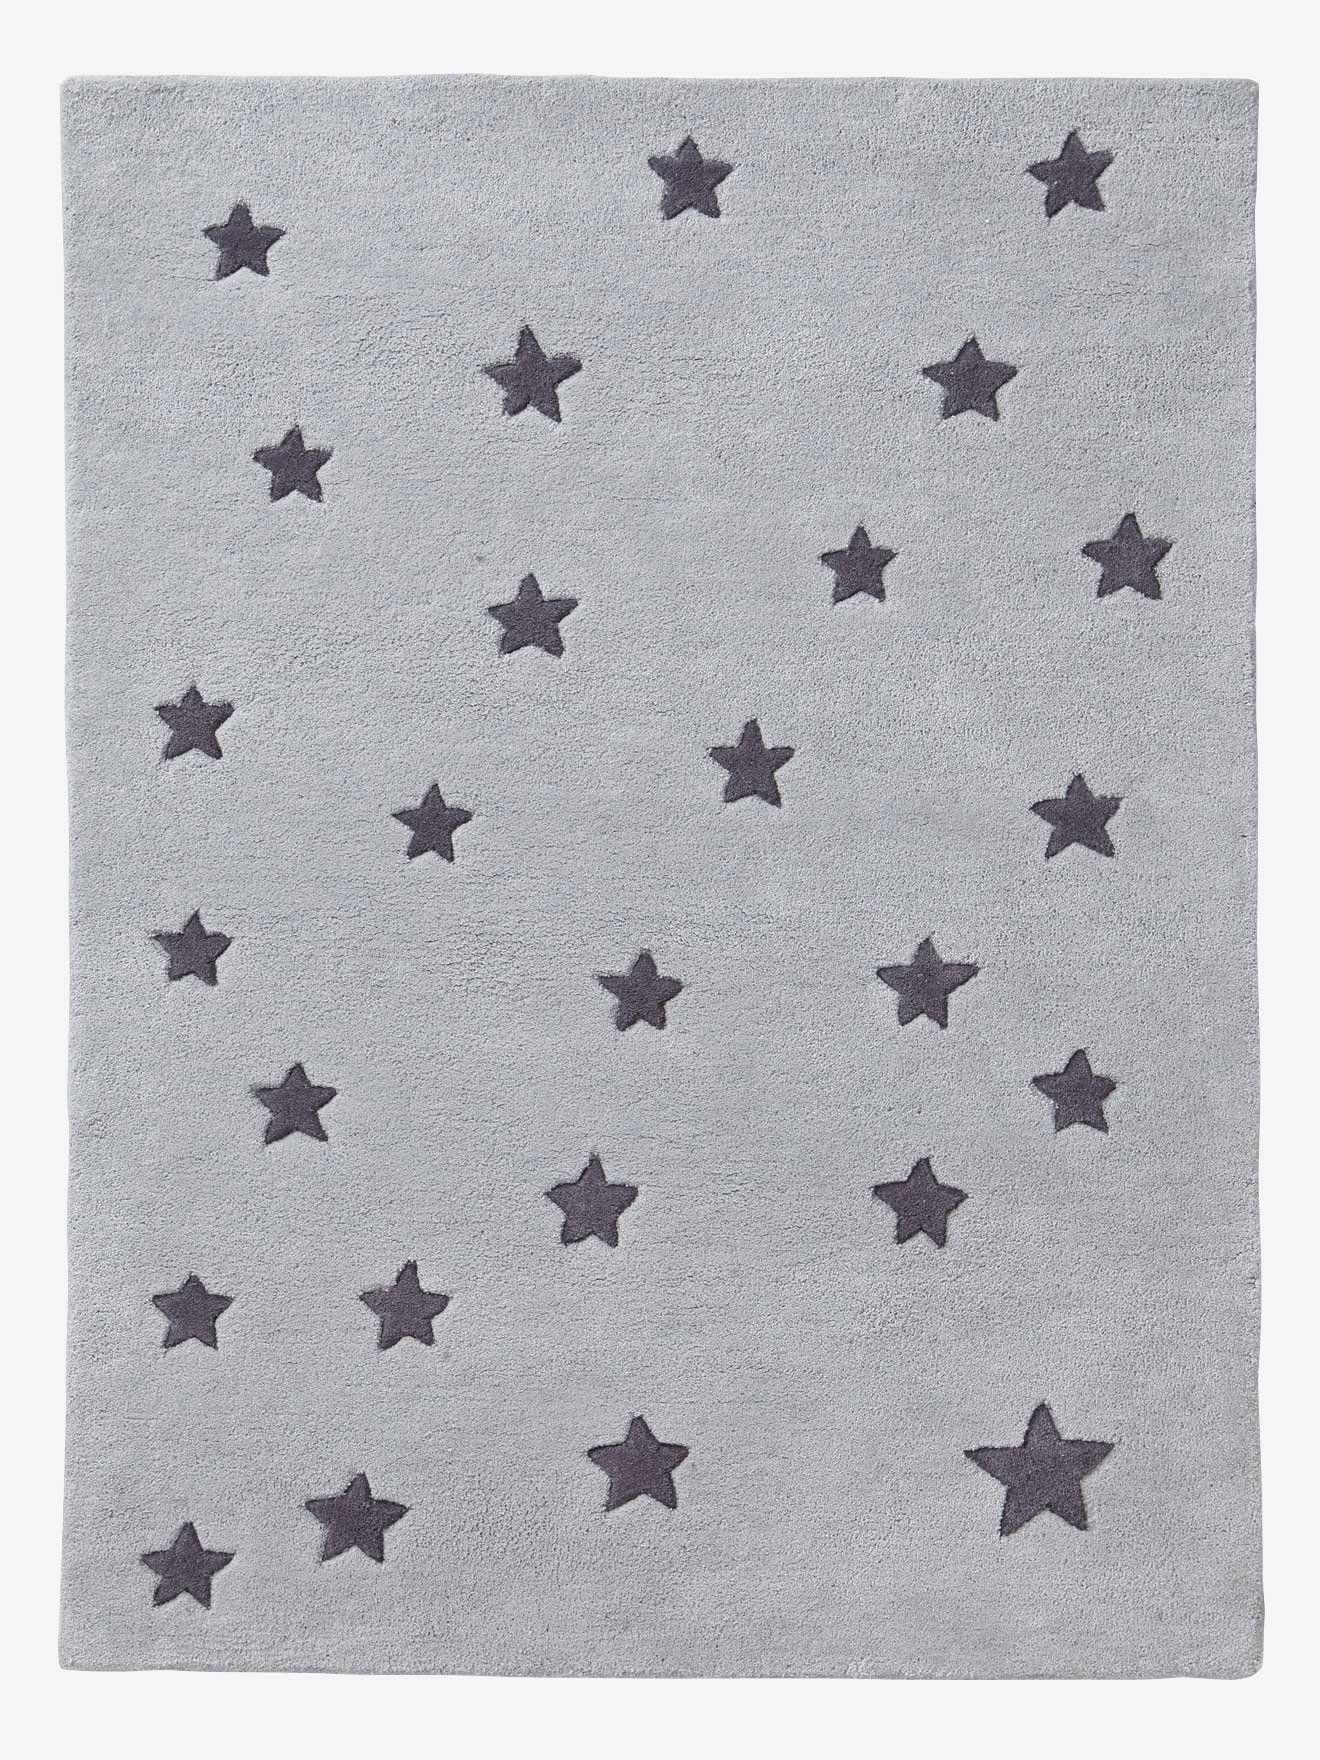 Tapis Petites étoiles - gris/étoiles   BB en 2019   Tapis ...